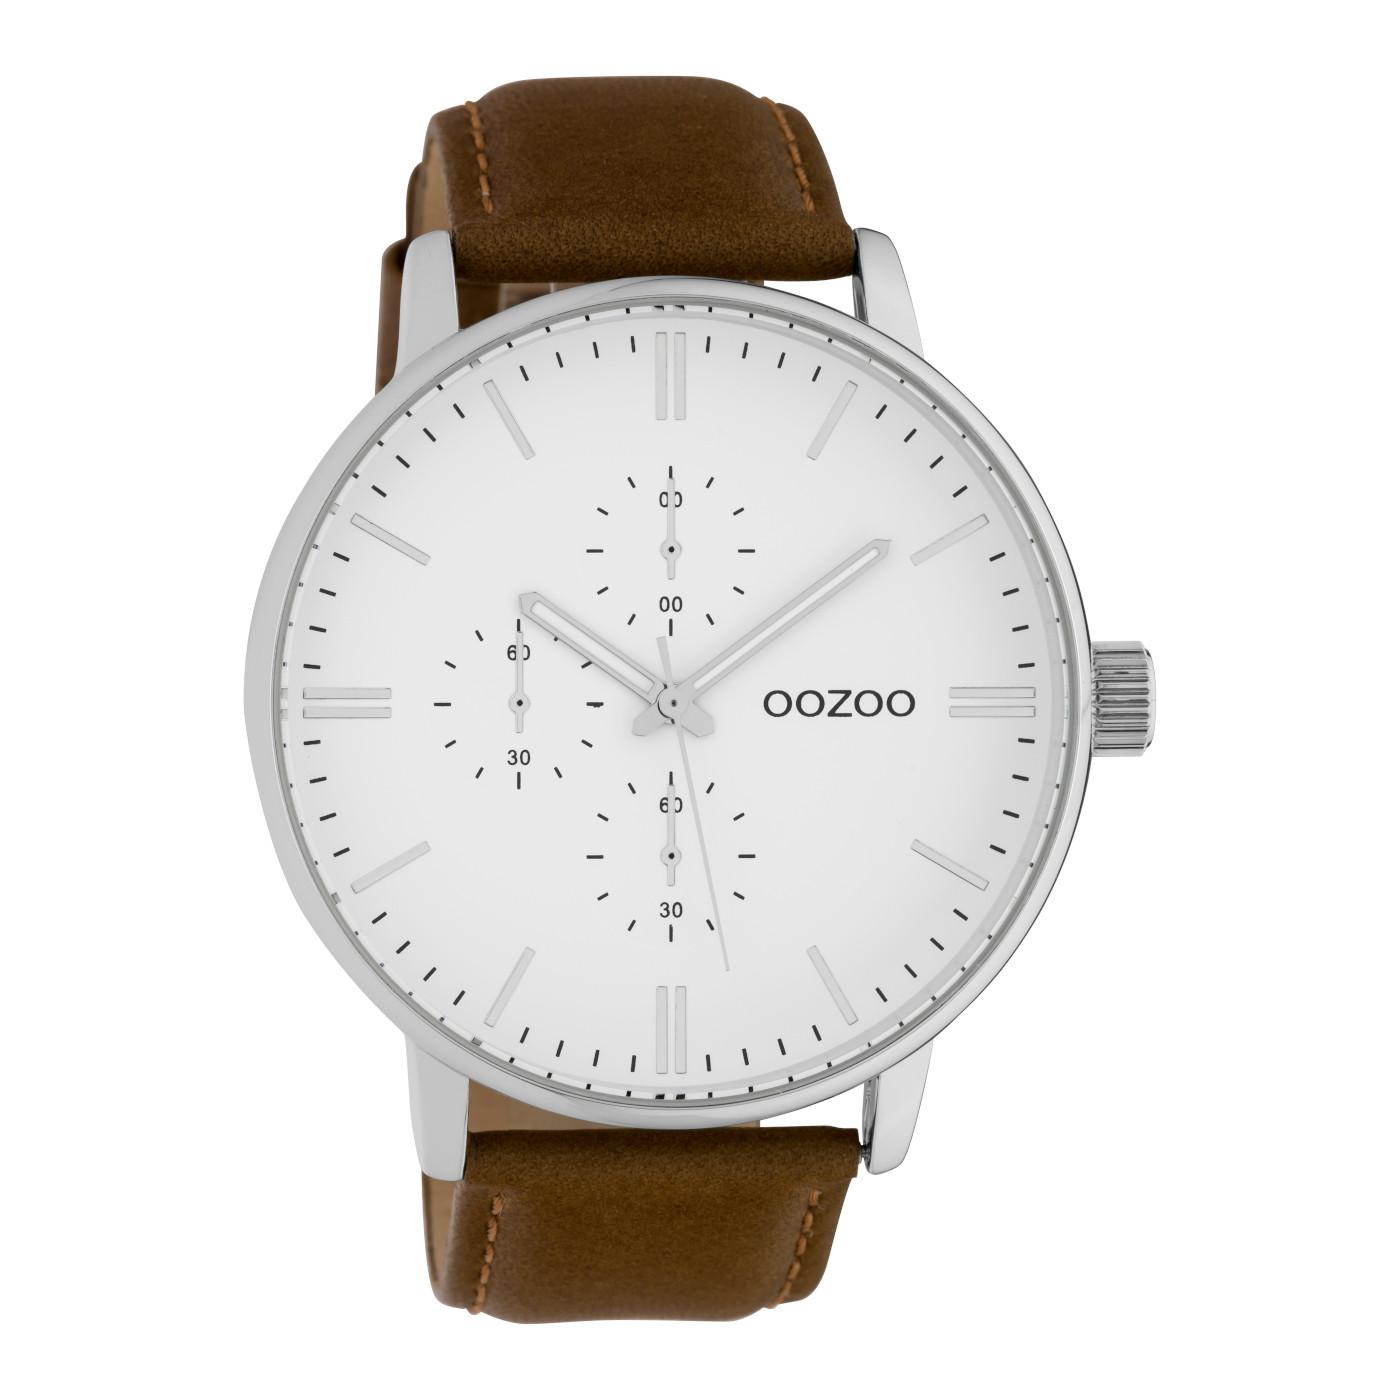 OOZOO Timepieces Bruin/Wit horloge C10311 (50 mm)